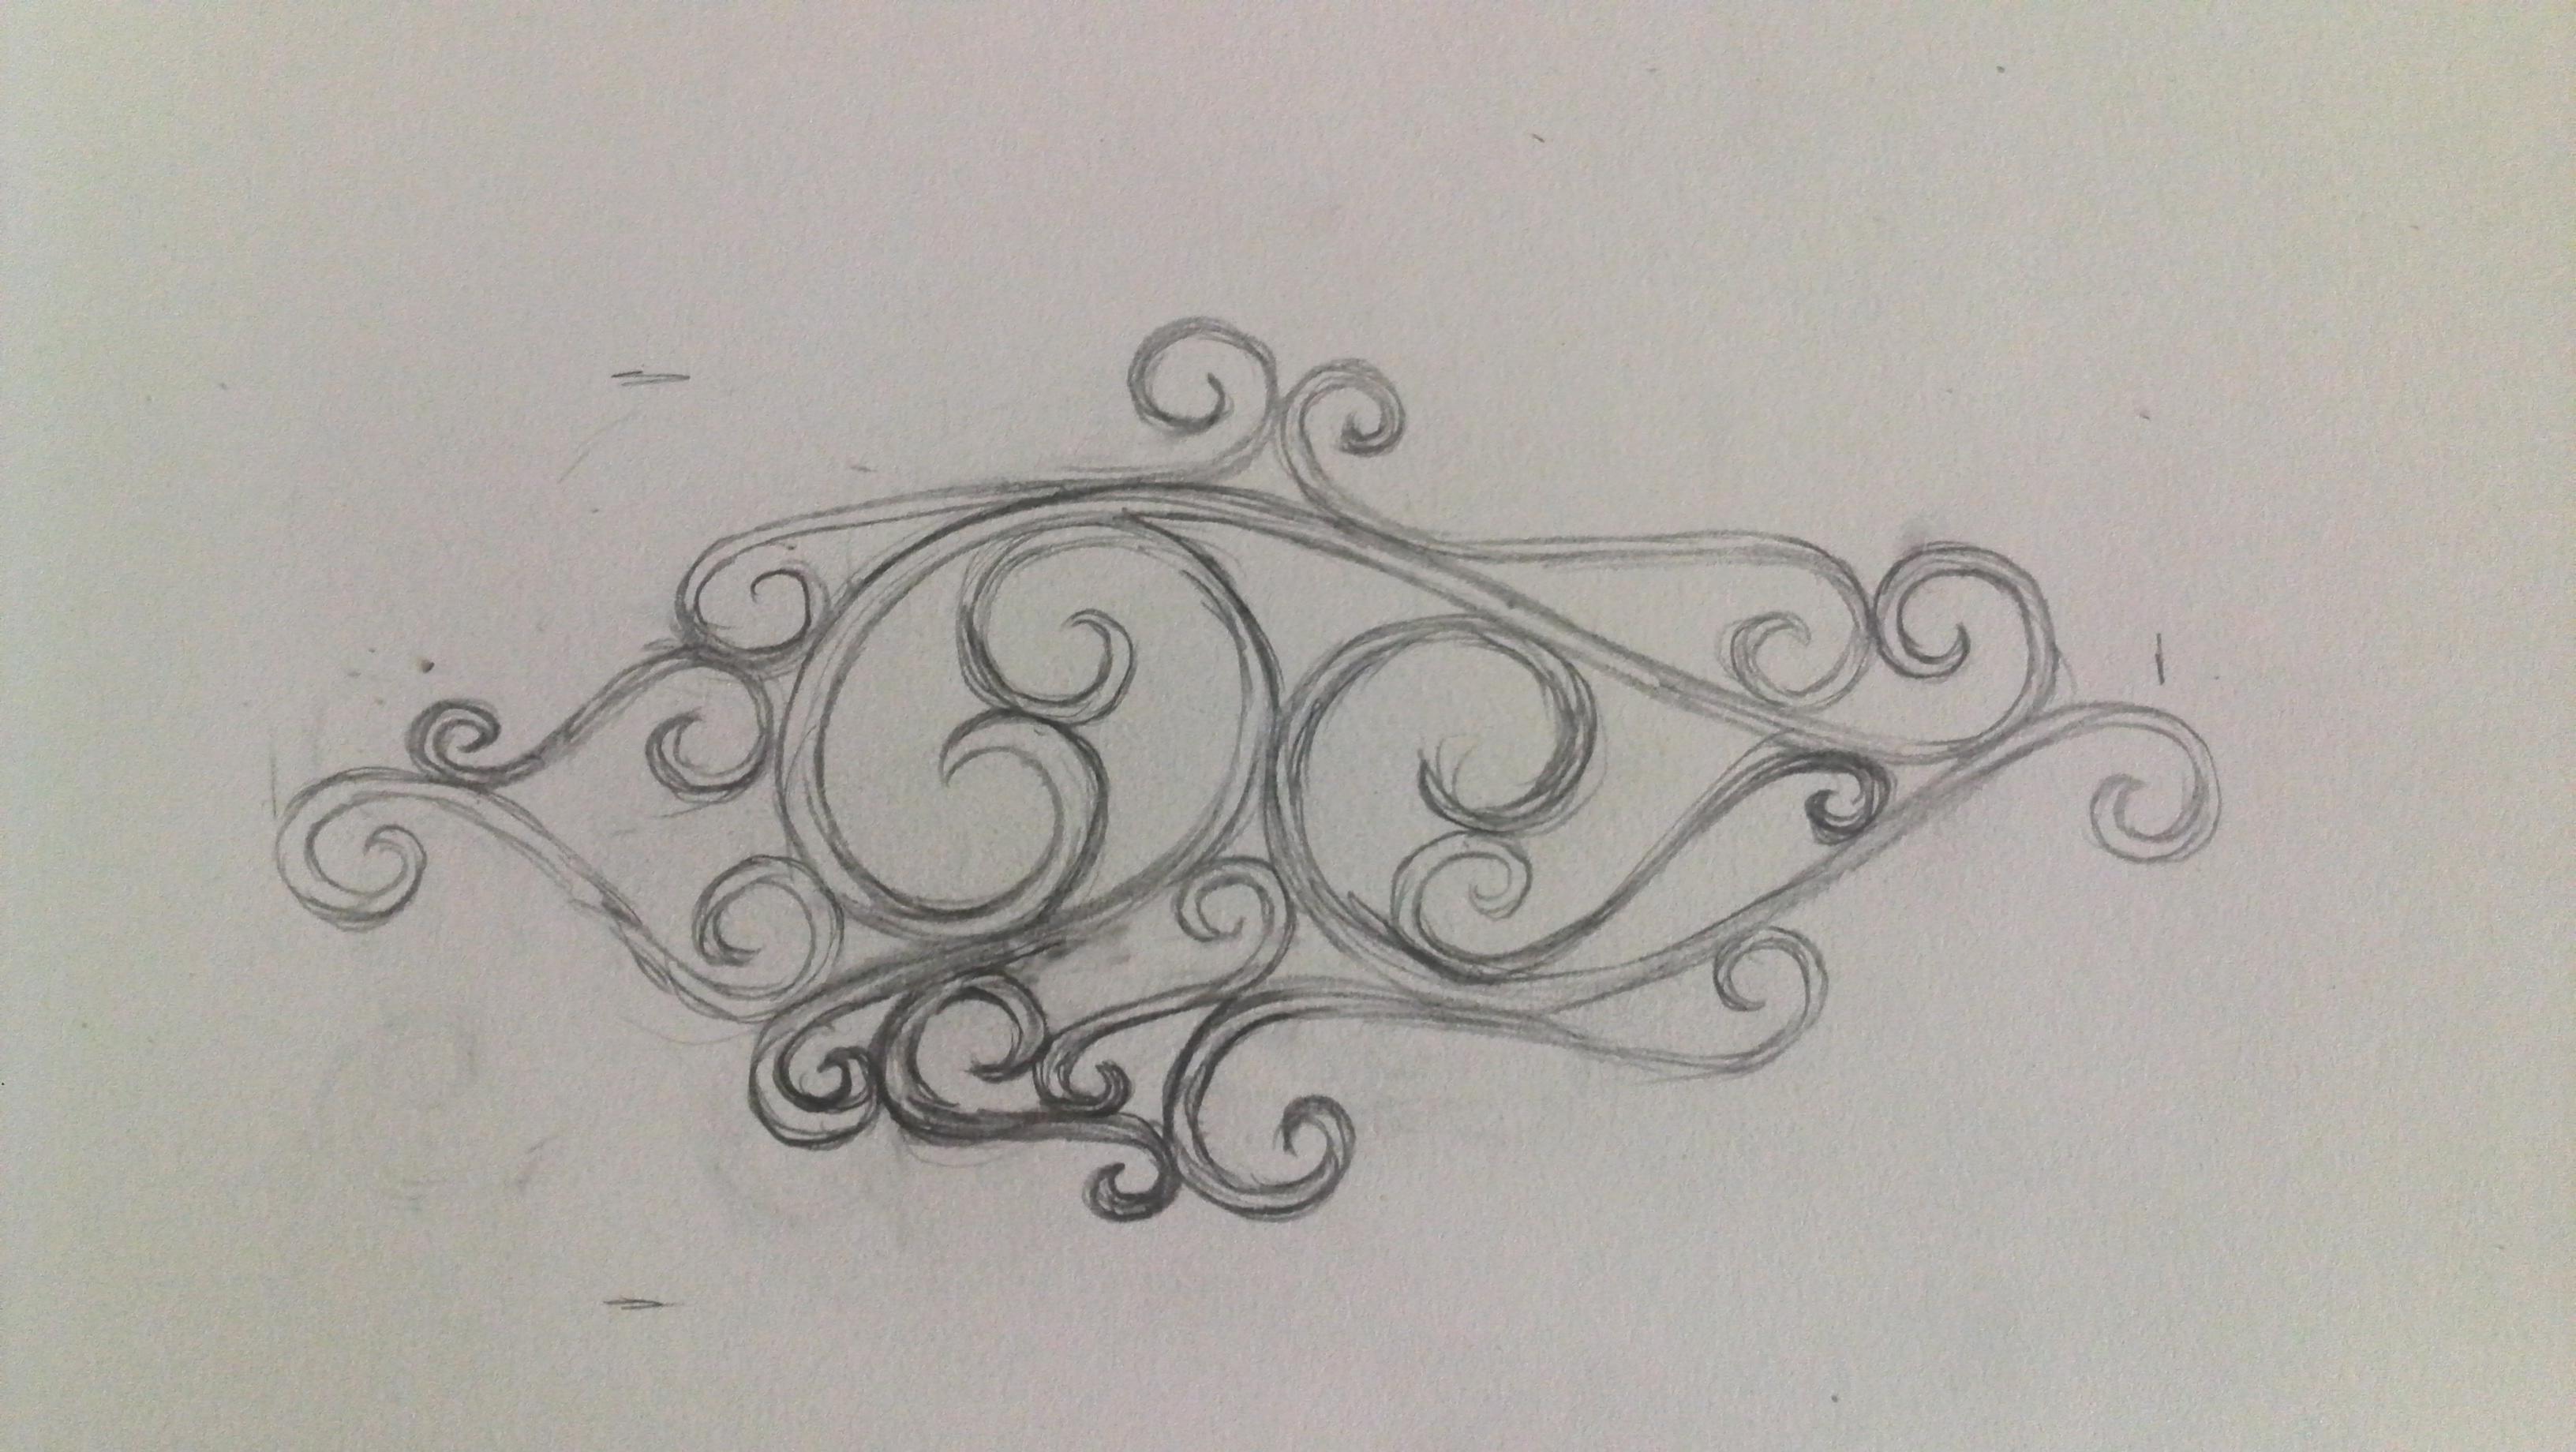 Siwrly Bracelet Progress ~ Sketch to Finished Product ...